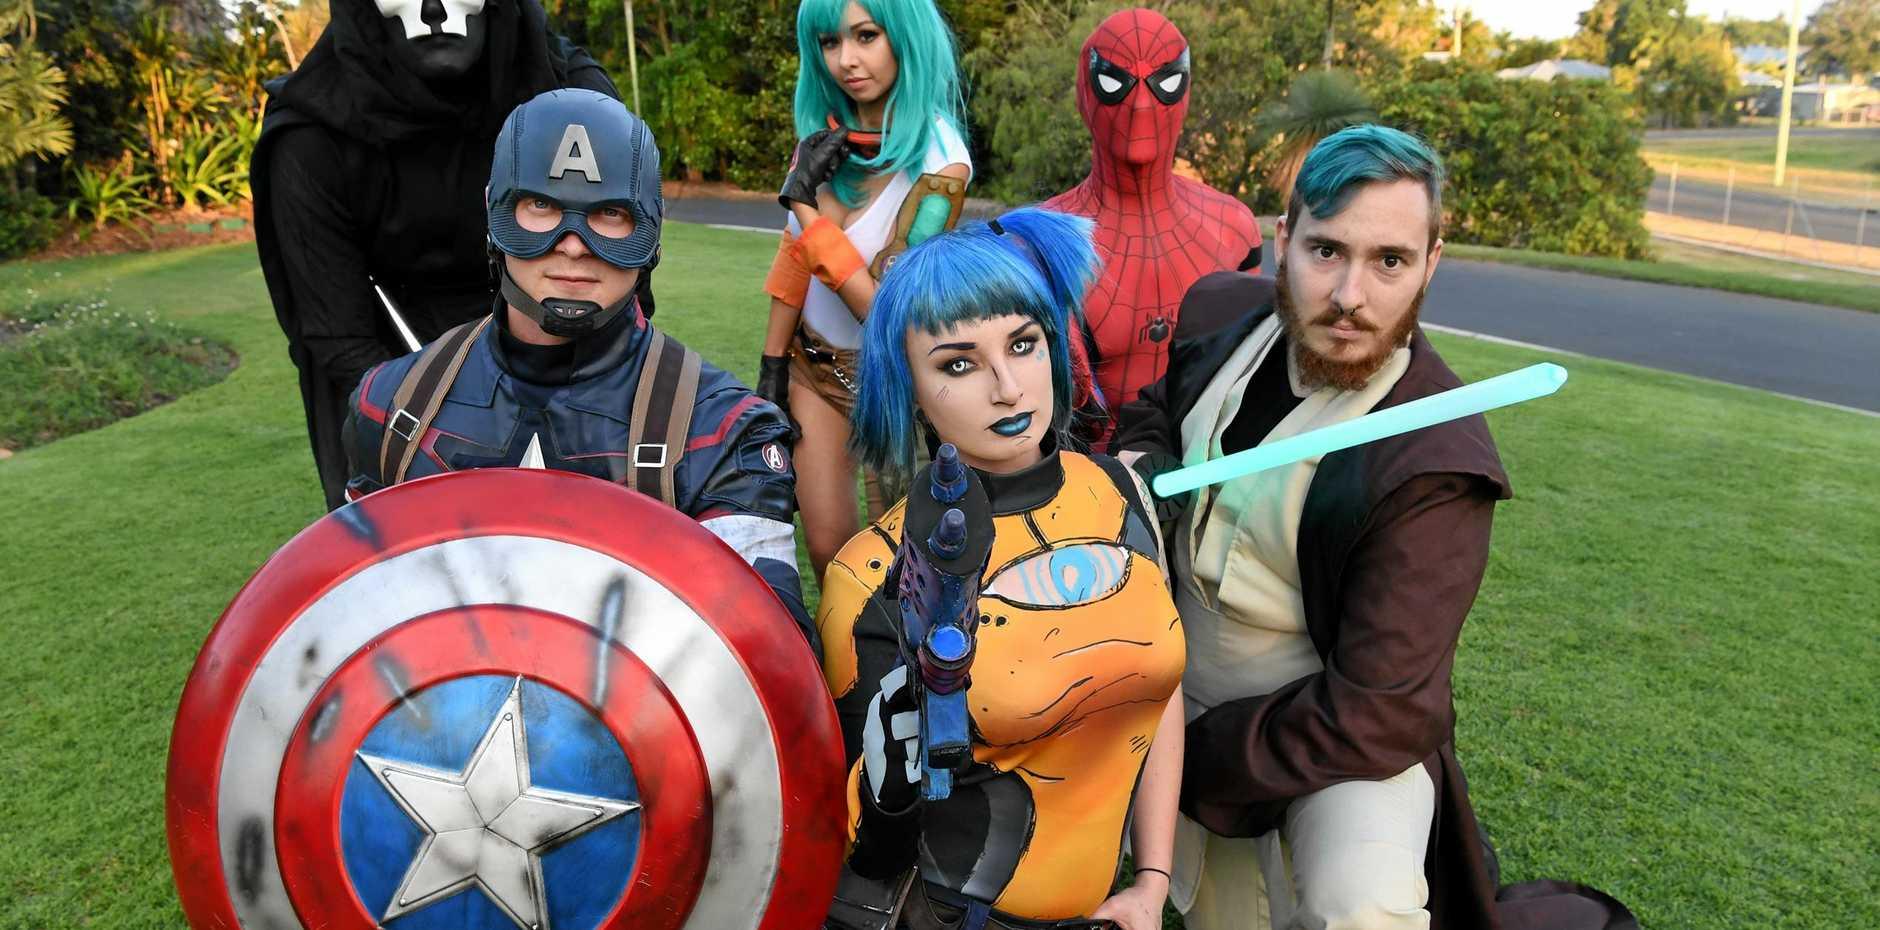 SUPER: Ethan Ramsey as Captain America, Jess Stardust as Maya, Adam Nicol as Jedi Warrior (front), Tim Clark as Darth Nihilus, Amy Thunderbolt as Bulma and Tim Scarborough as Spiderman.